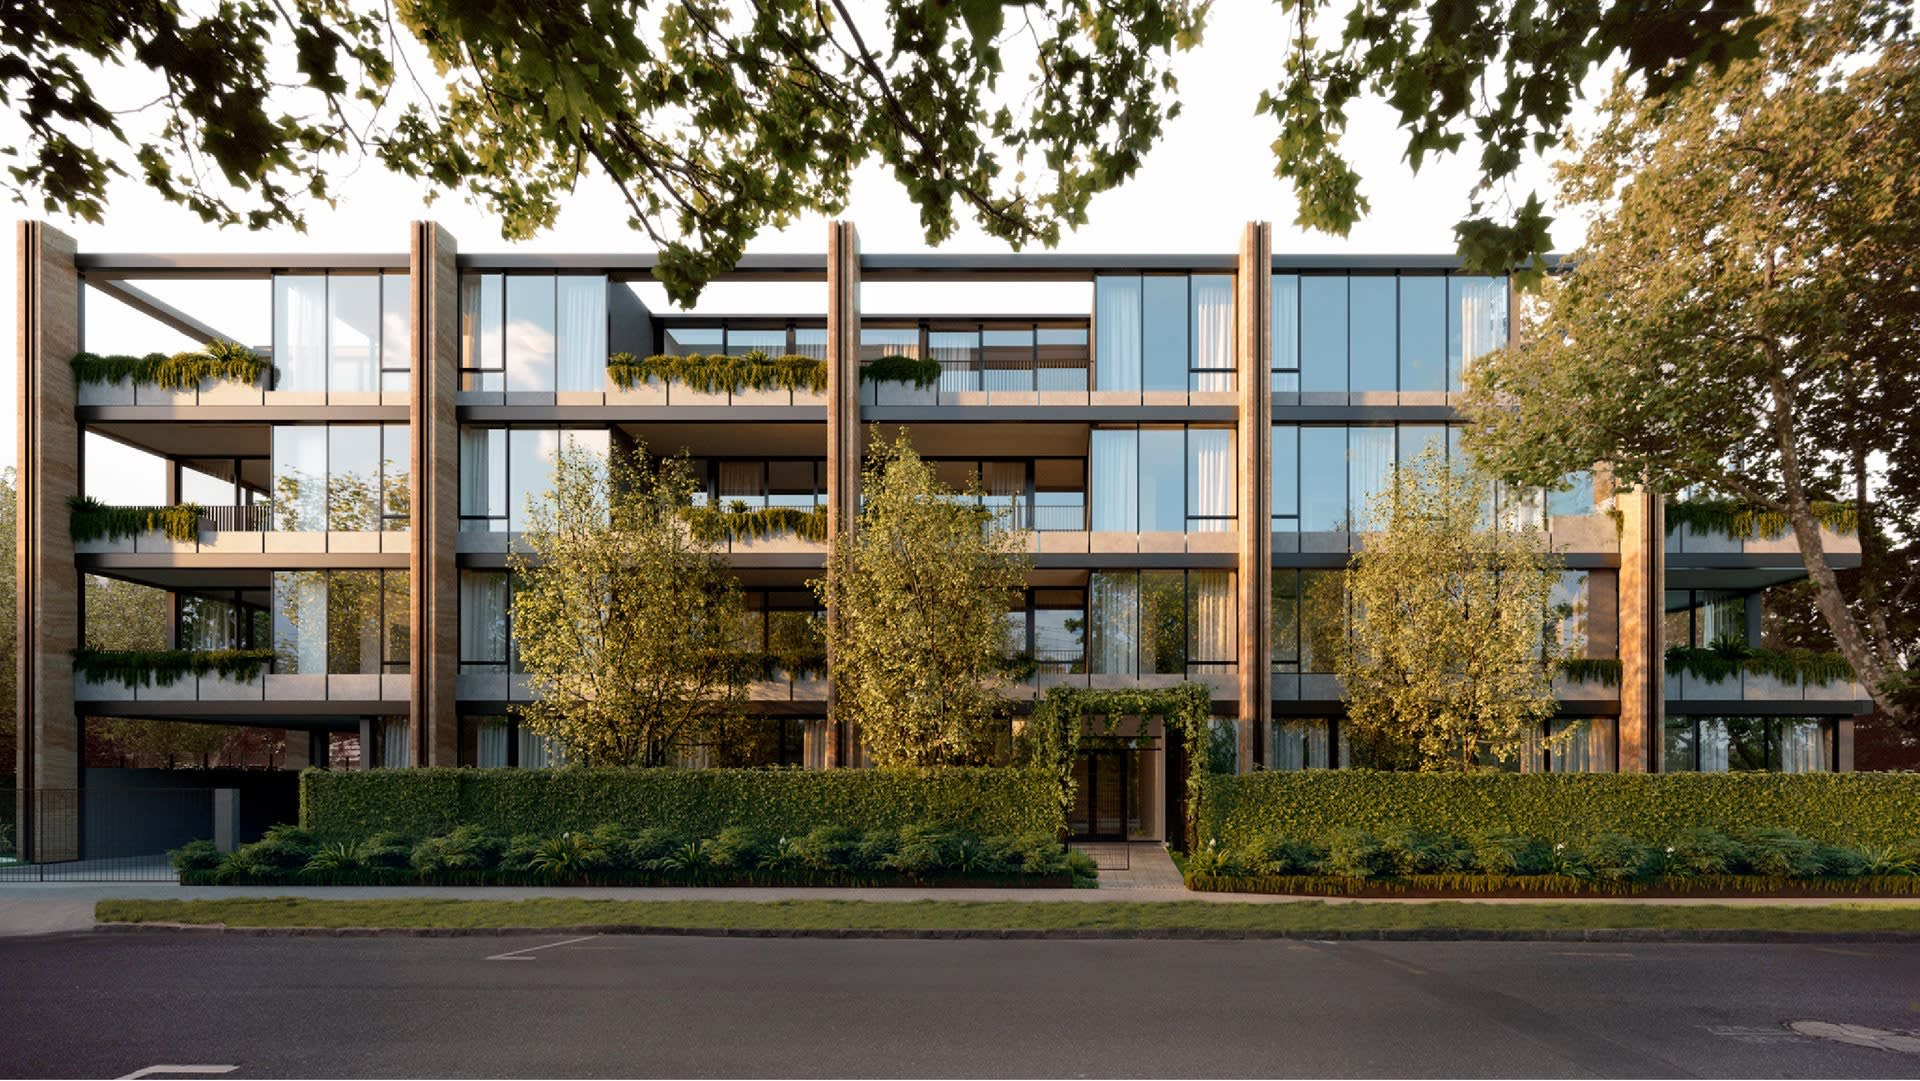 Highly anticipated Malvern East property hits the market: Celebrating Hurstmon's grand launch